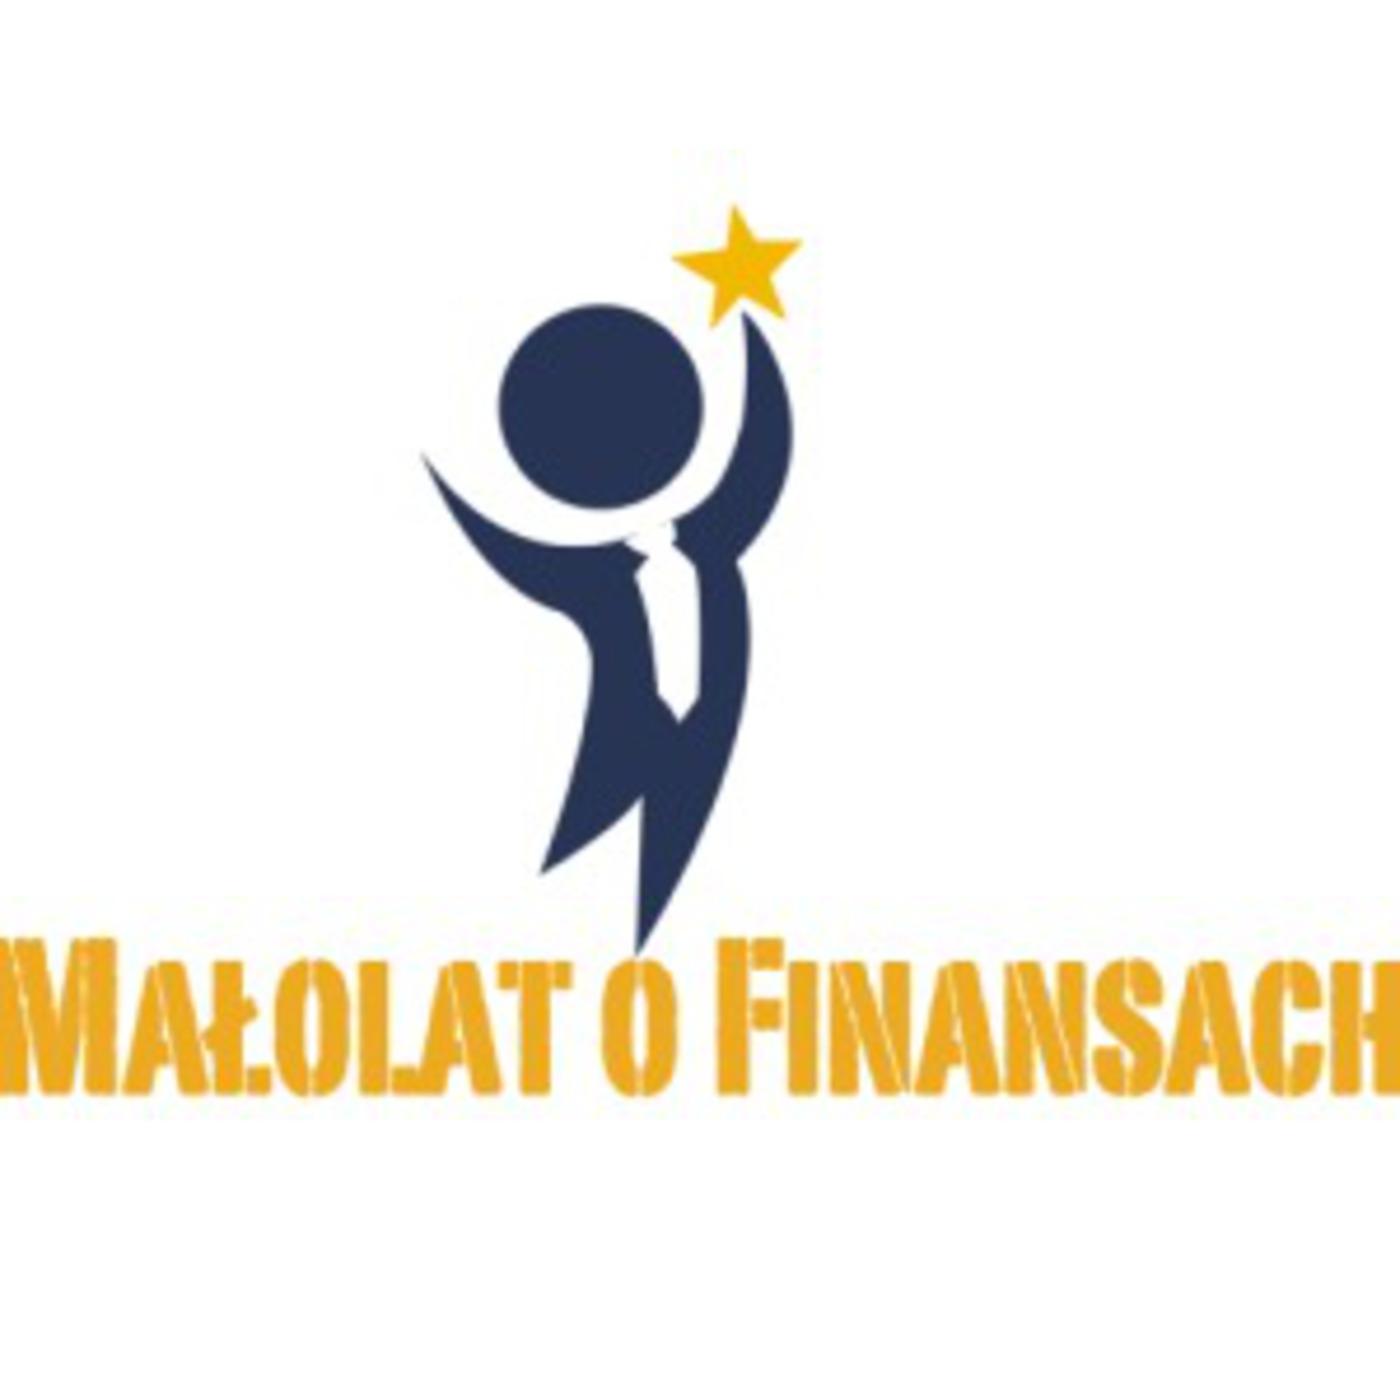 Biznes13Plus.pl - Małolat o Finansach